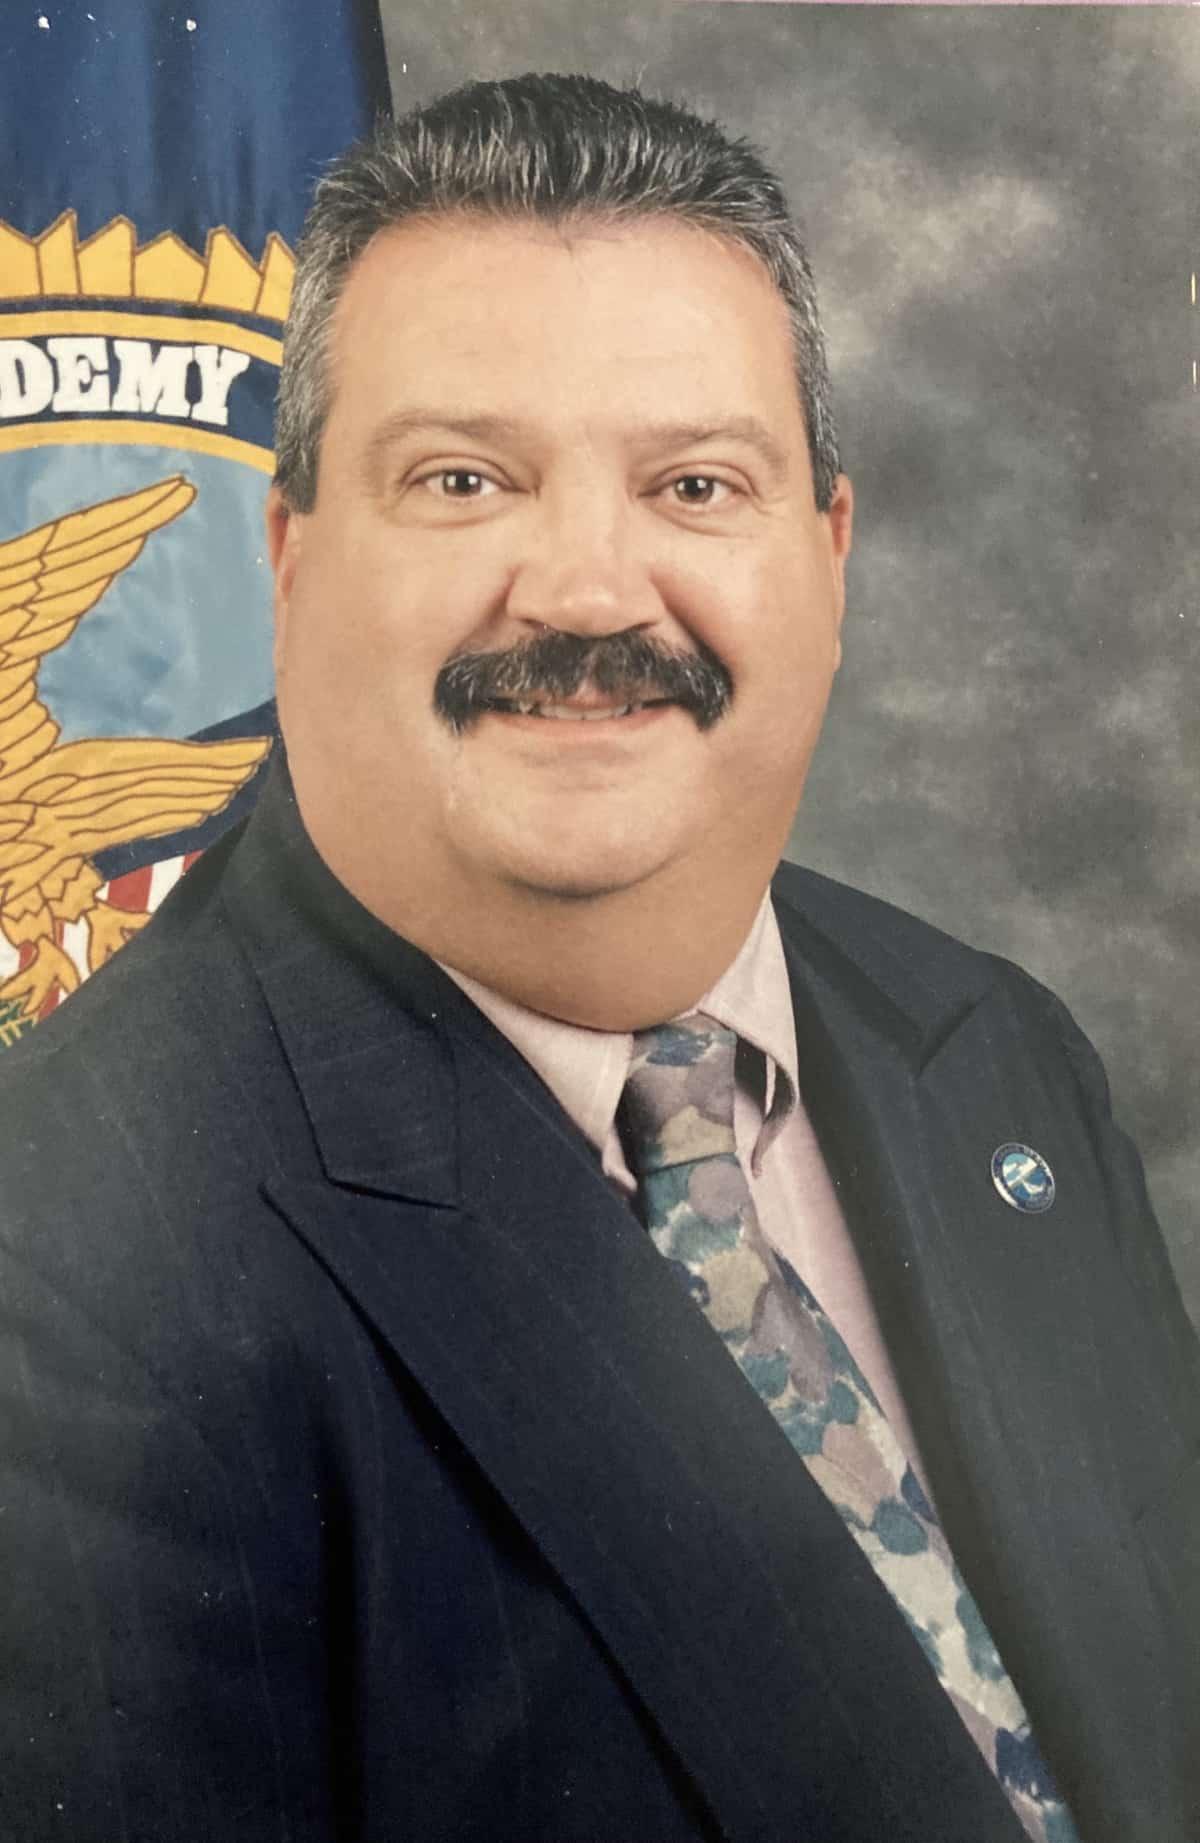 Oren James McCart III